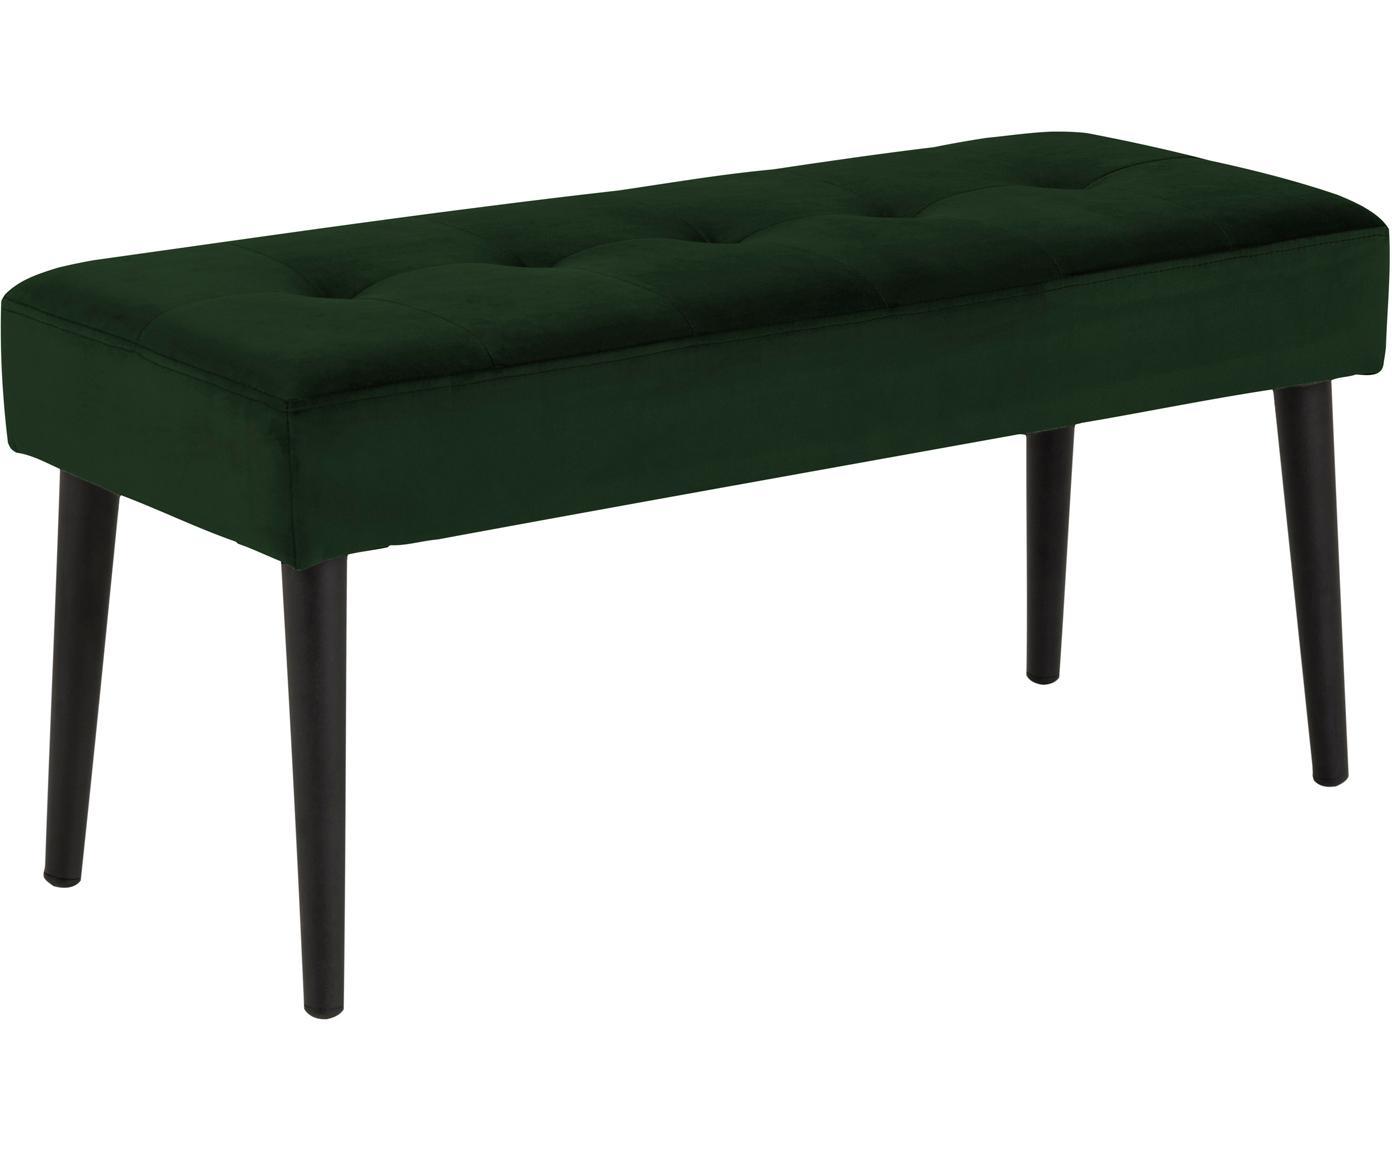 Samt-Sitzbank Glory, Bezug: Polyestersamt 25.000 Sche, Gestell: Metall, pulverbeschichtet, Dunkelgrün, 95 x 45 cm